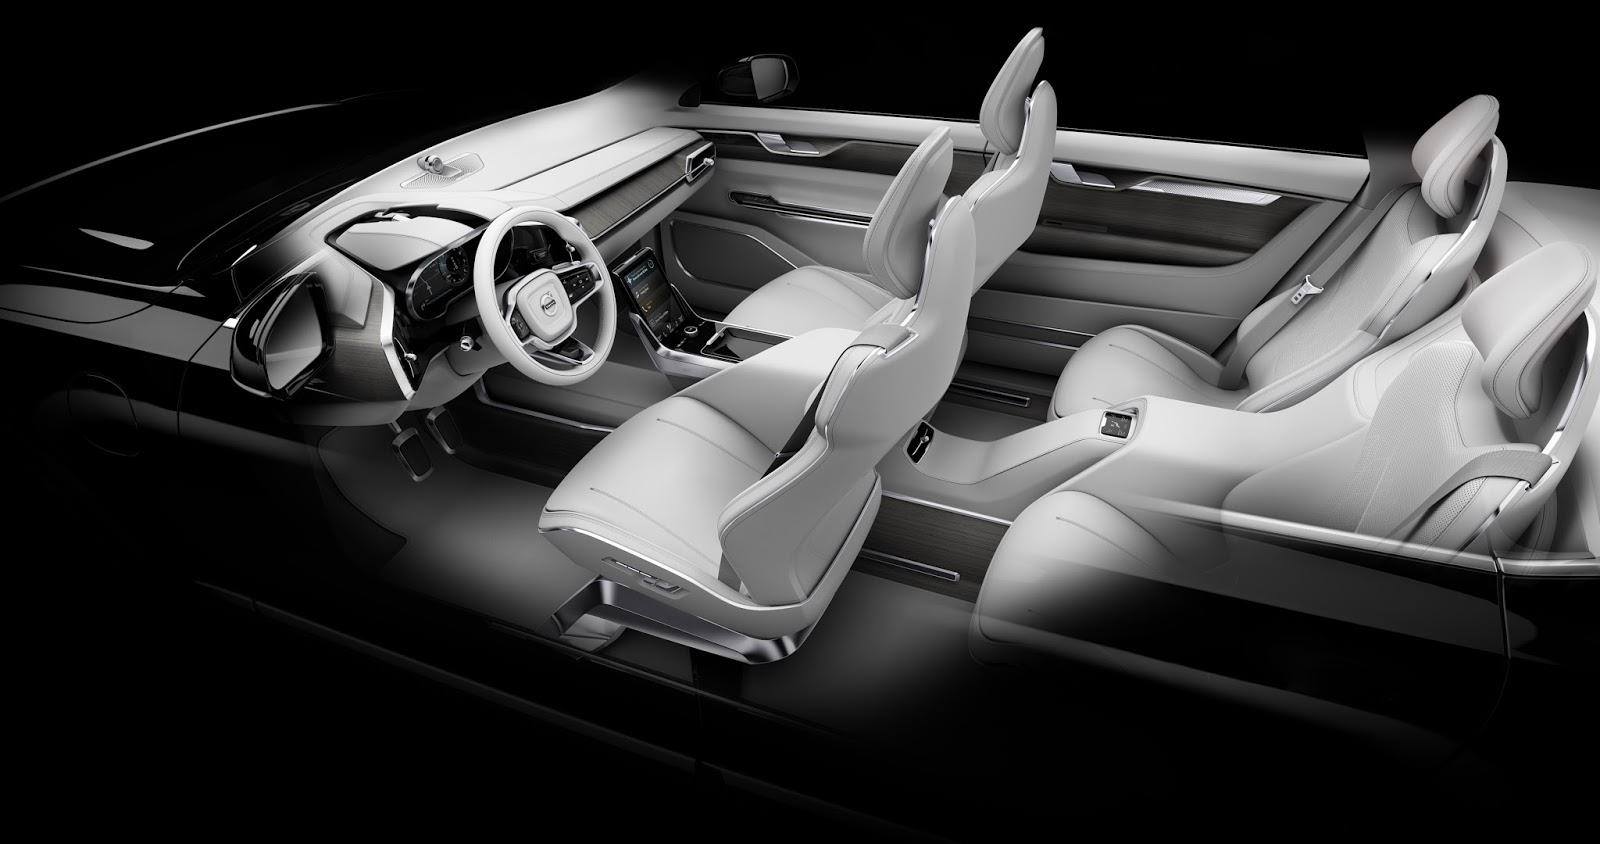 169544 Concept 26 Η Volvo θα κάνει και την αυτόνομη οδήγηση διασκεδαστική Autonomous Driving, Volvo, Volvo XC90, Αυτόνομη οδήγηση